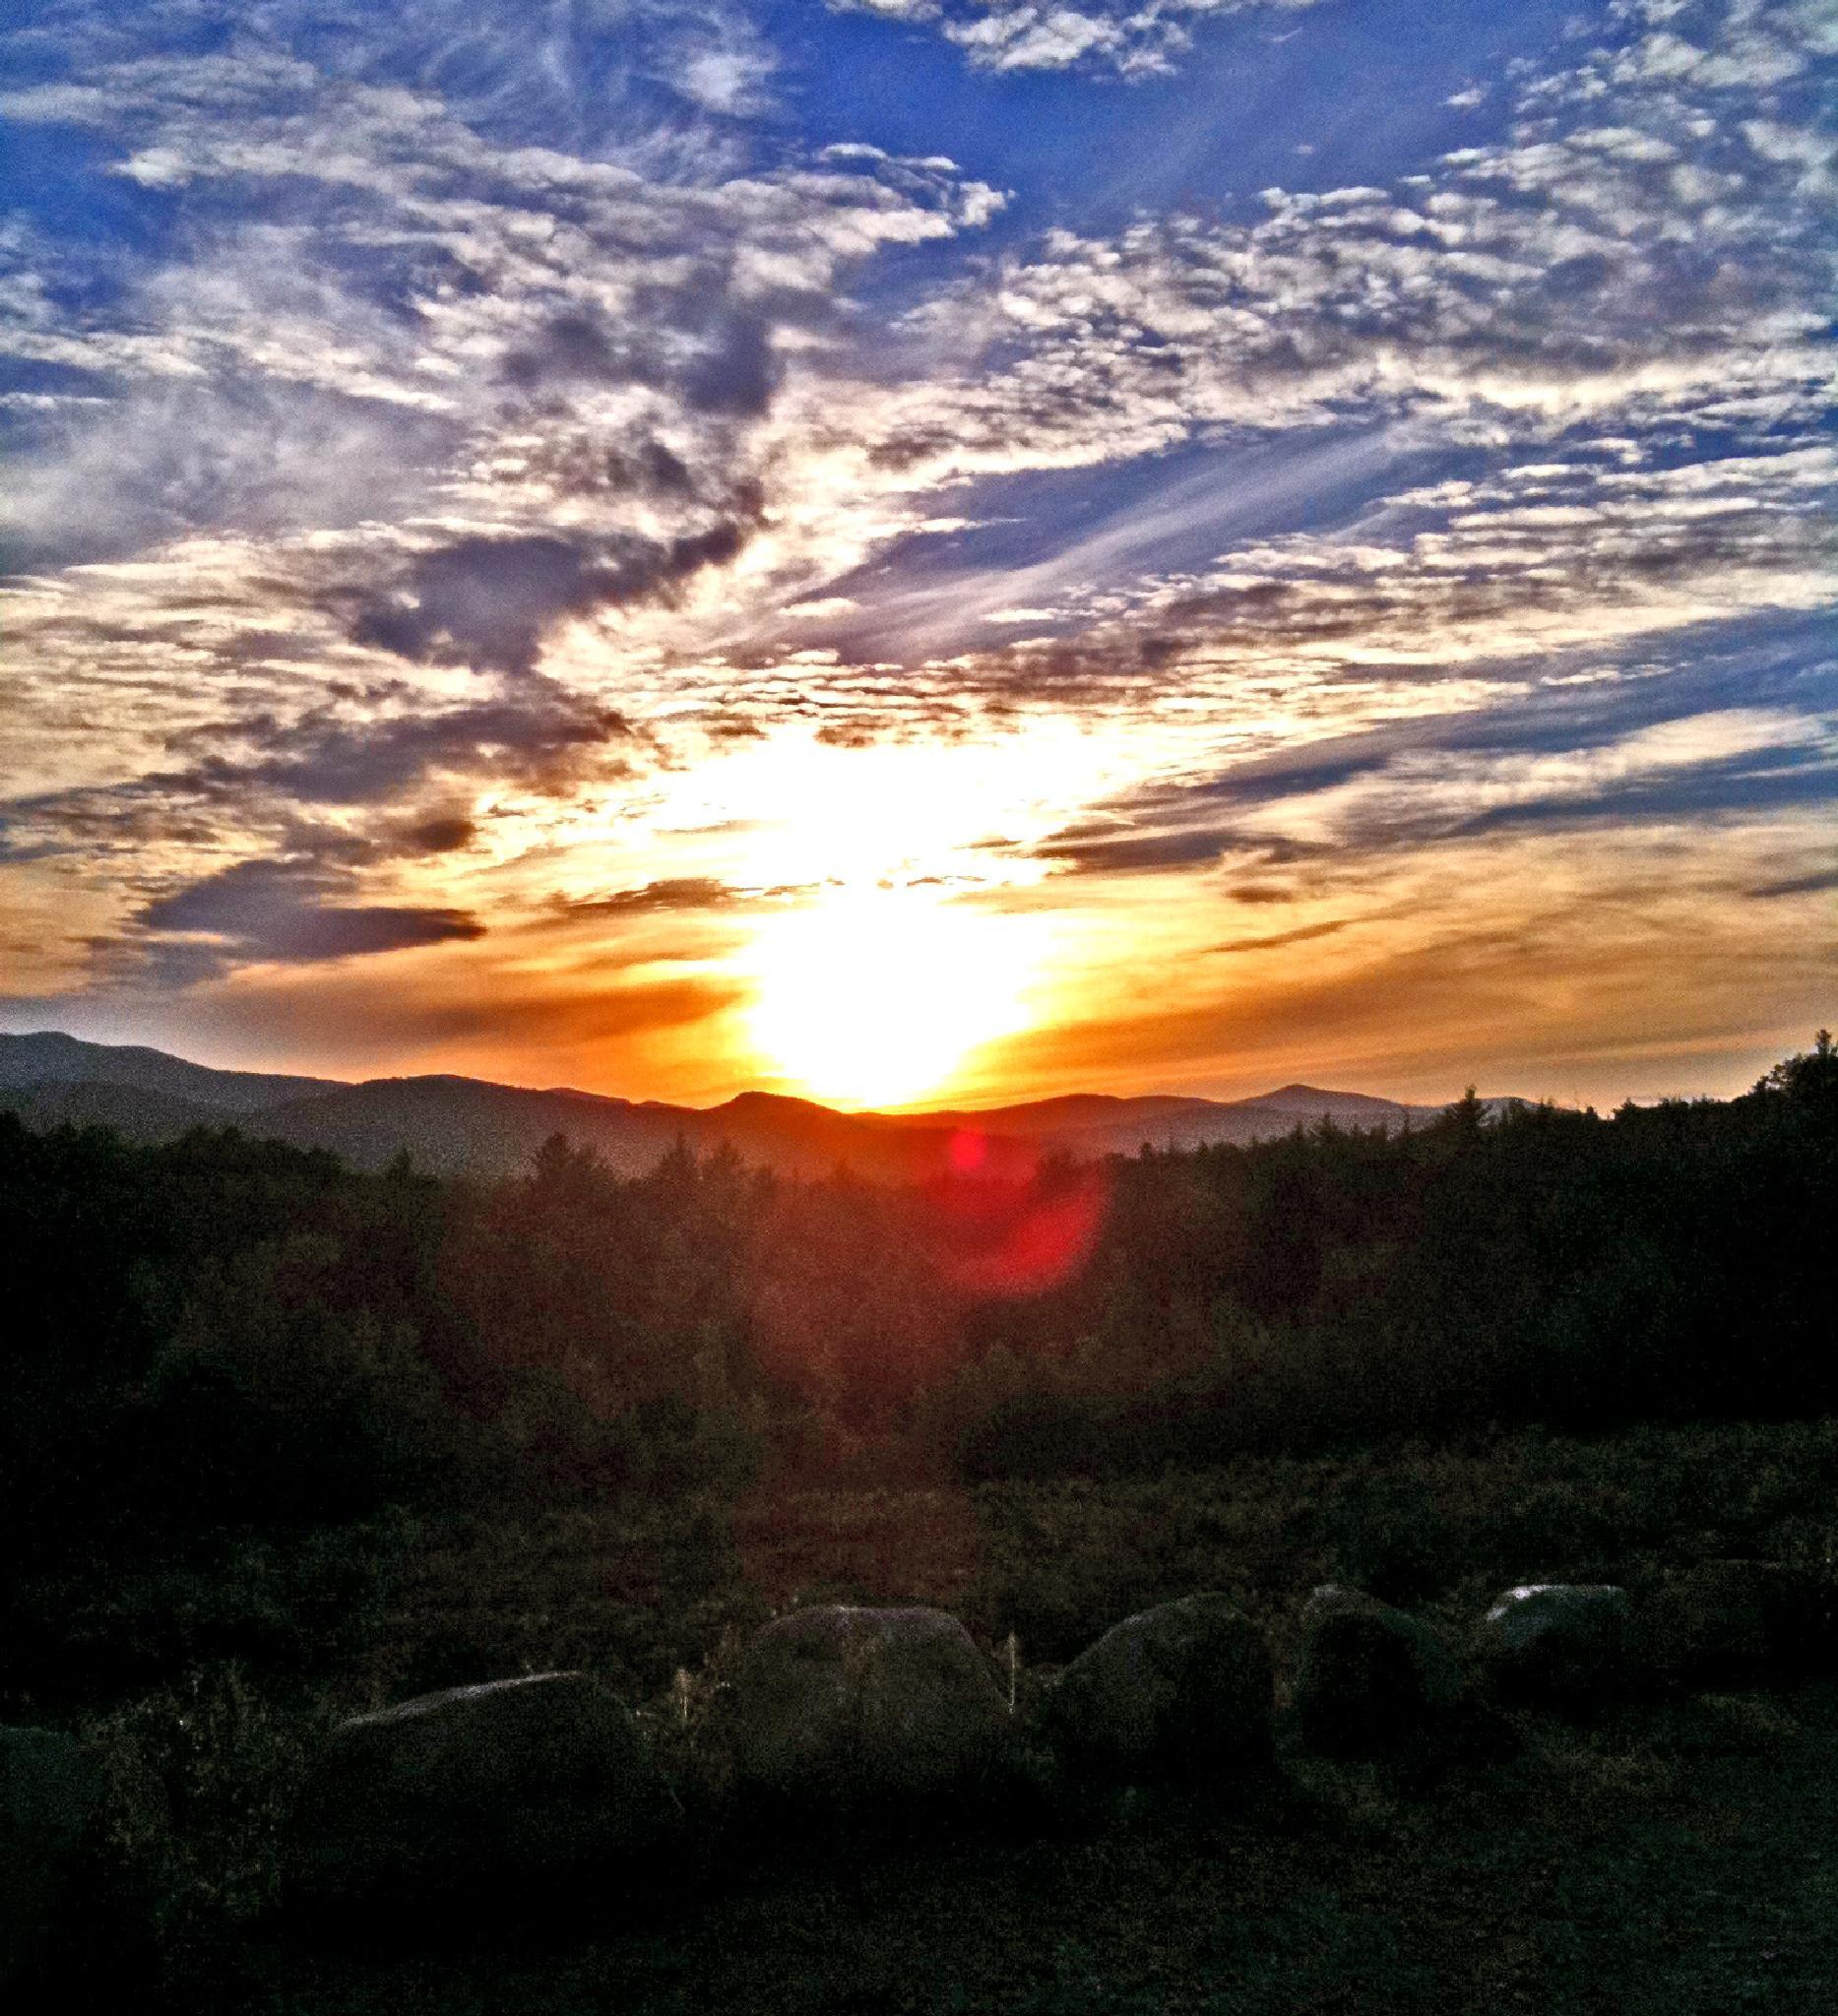 sun down by SassieKatt